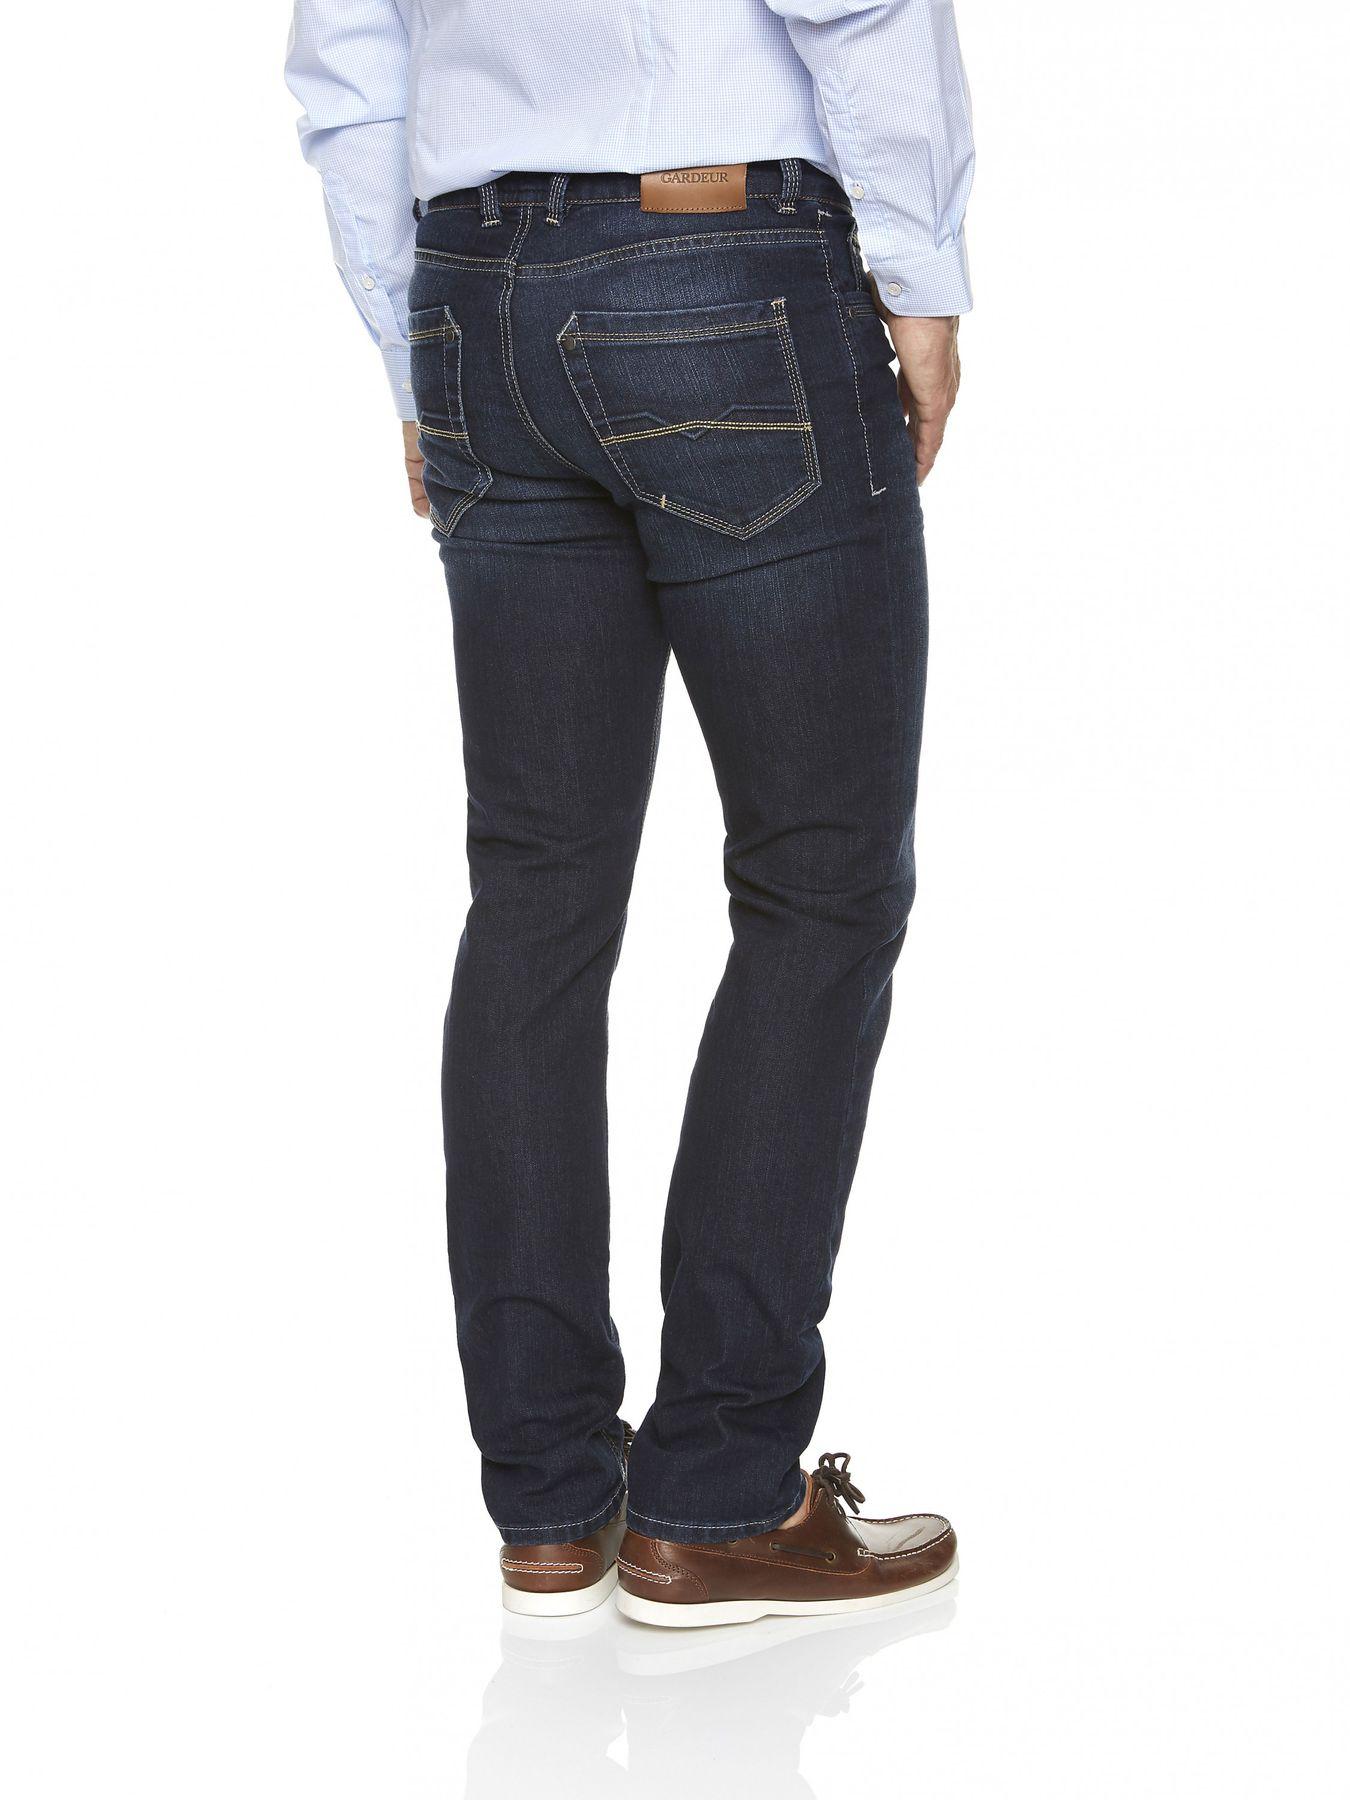 Atelier Gardeur - Herren 5-Pocket Jeans Superflex, Farben black(99), dark stone(68), stone blue(67), anthrazit(198) BATU (71001) – Bild 8